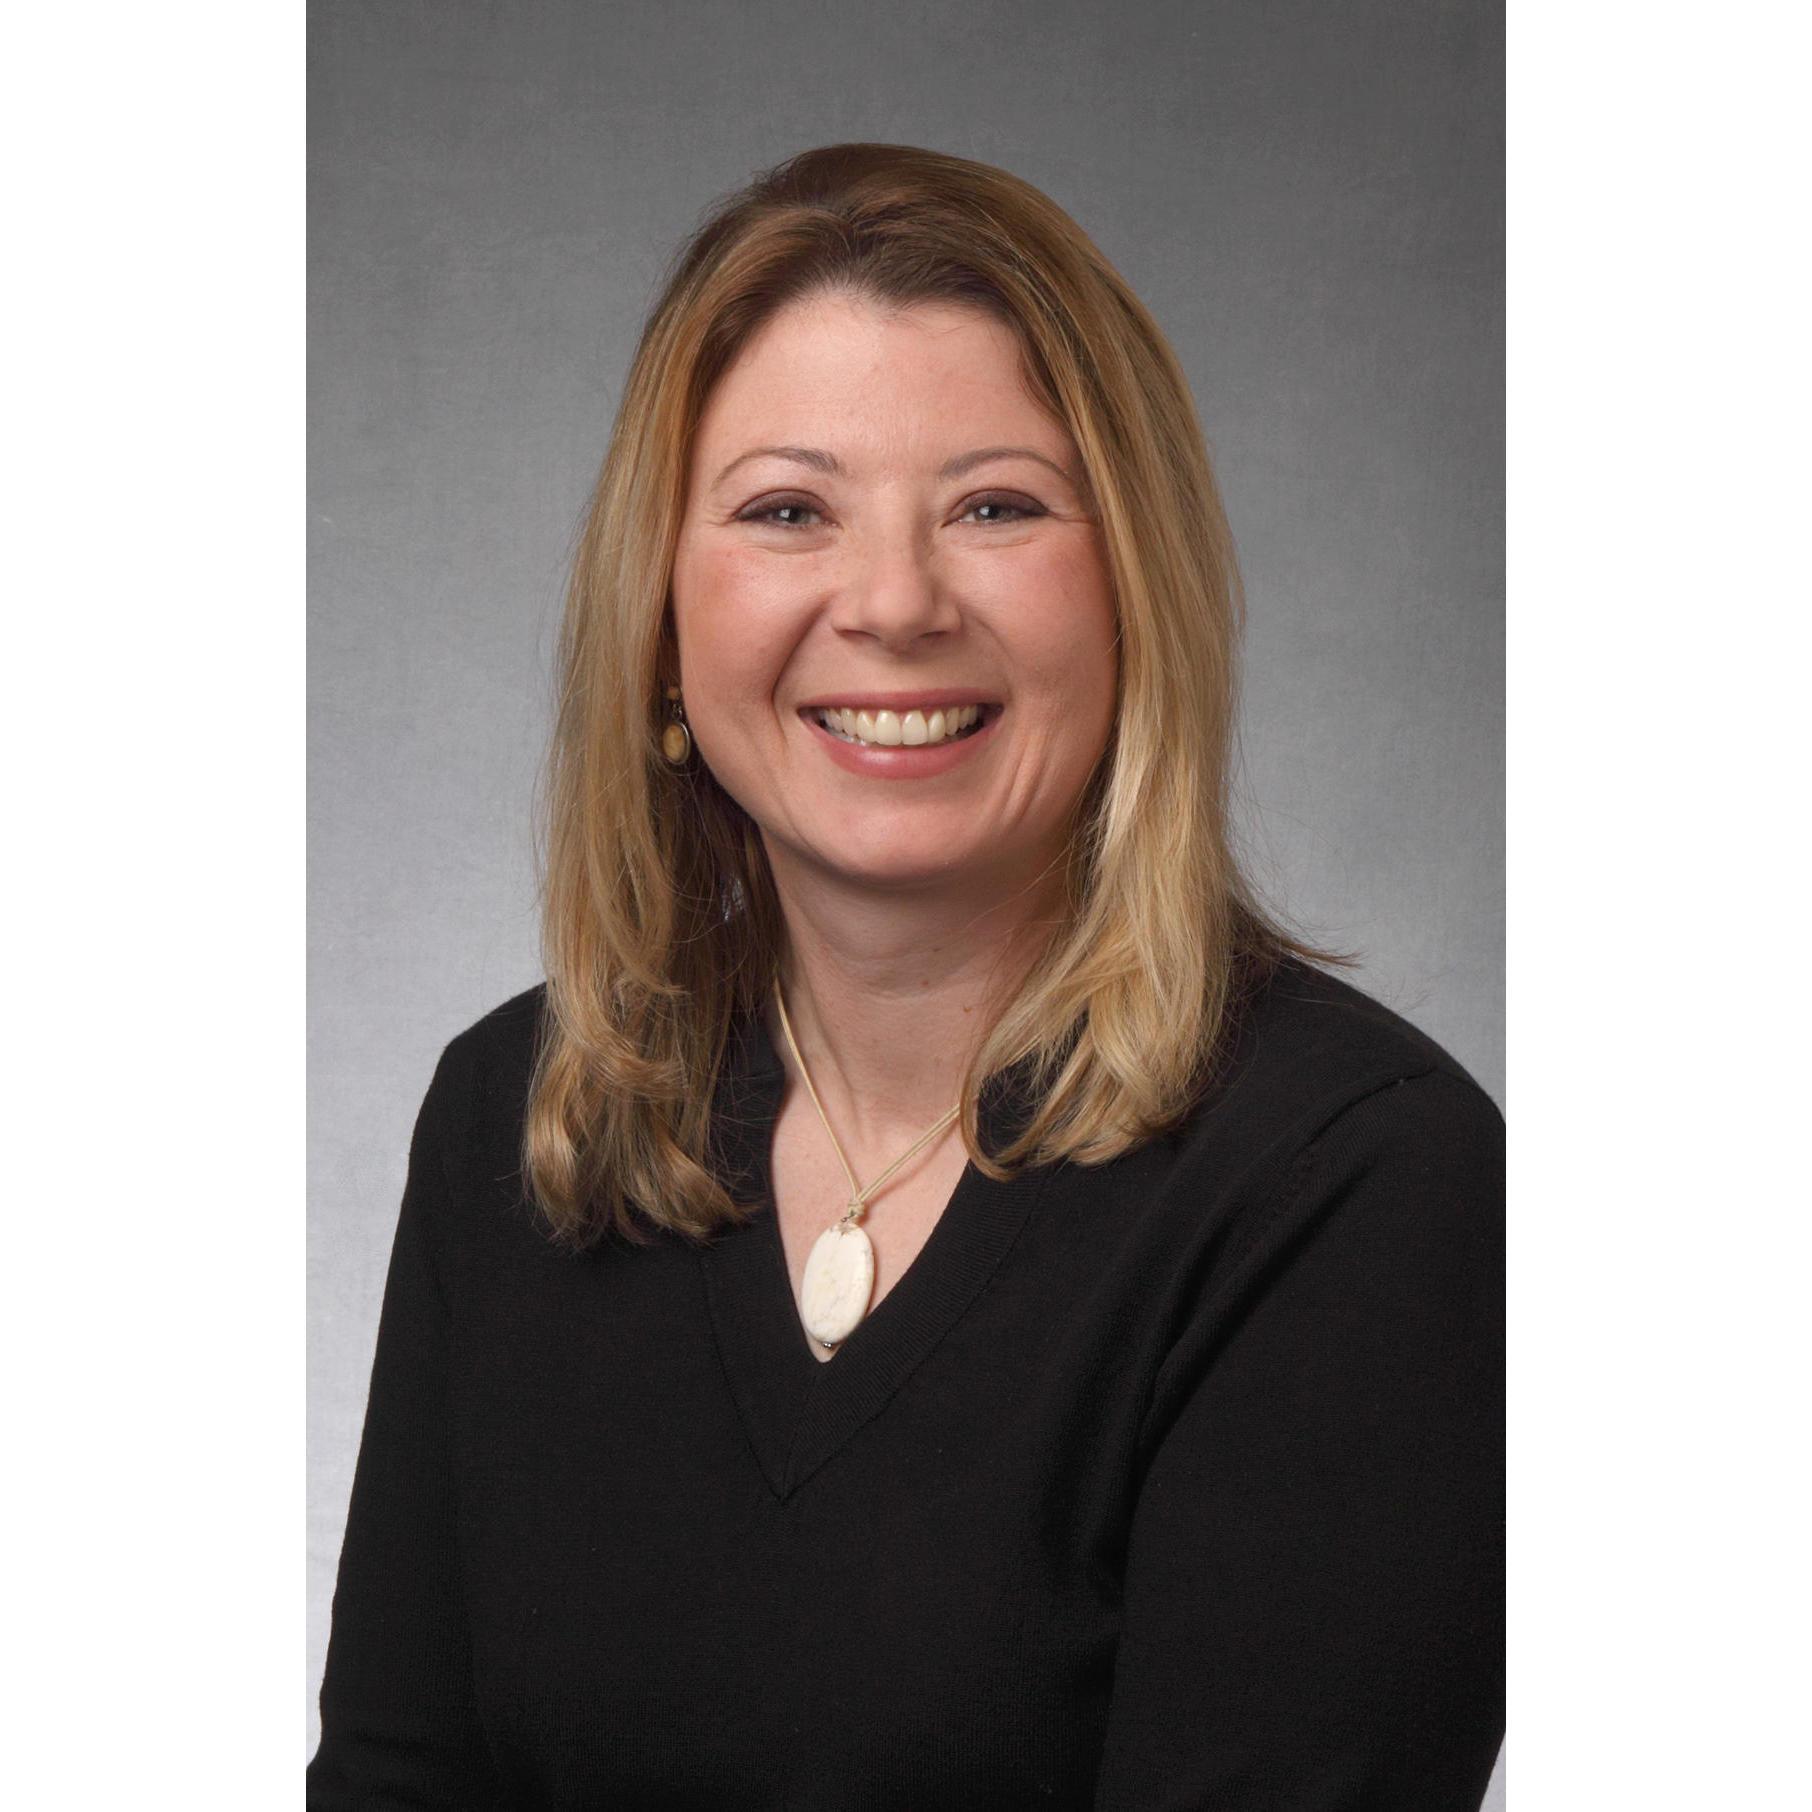 Joanne Vicari, MD